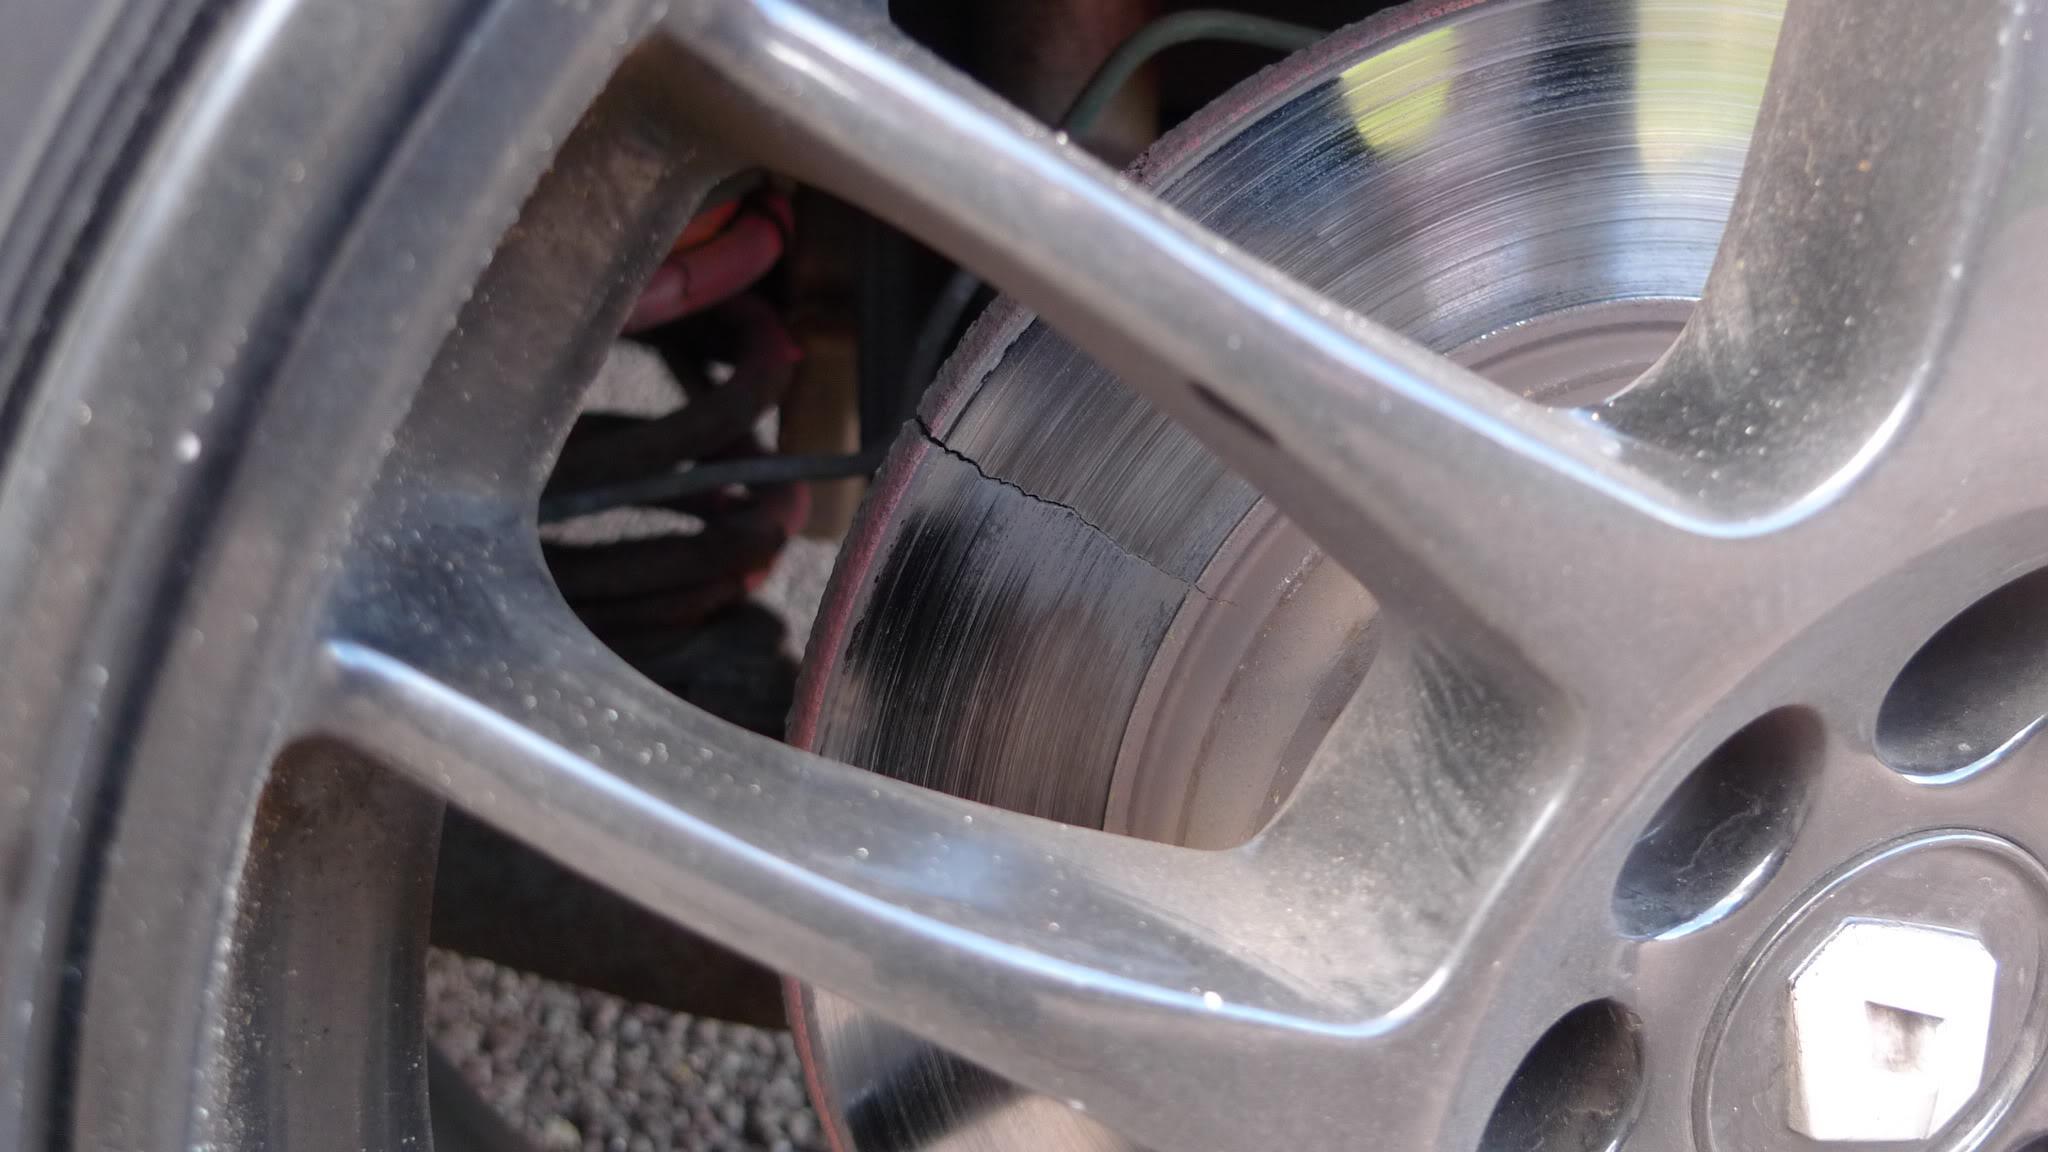 Cracked brake disc | ClioSport net